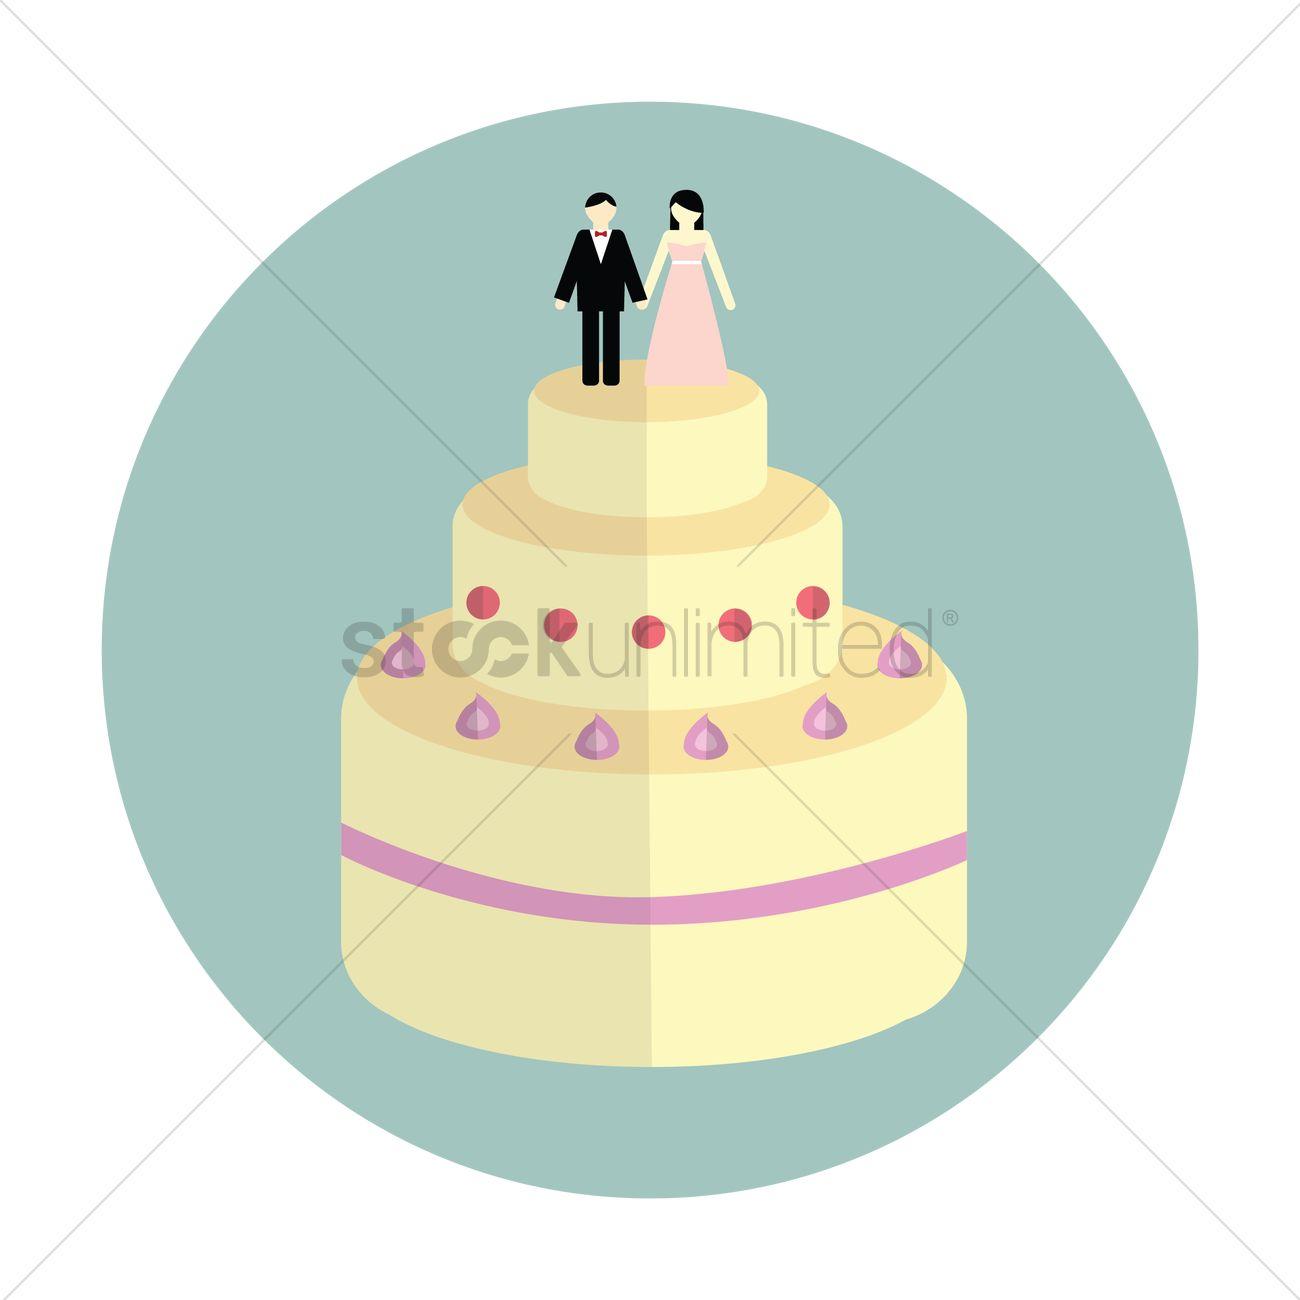 Wedding cake Vector Image - 1375491 | StockUnlimited